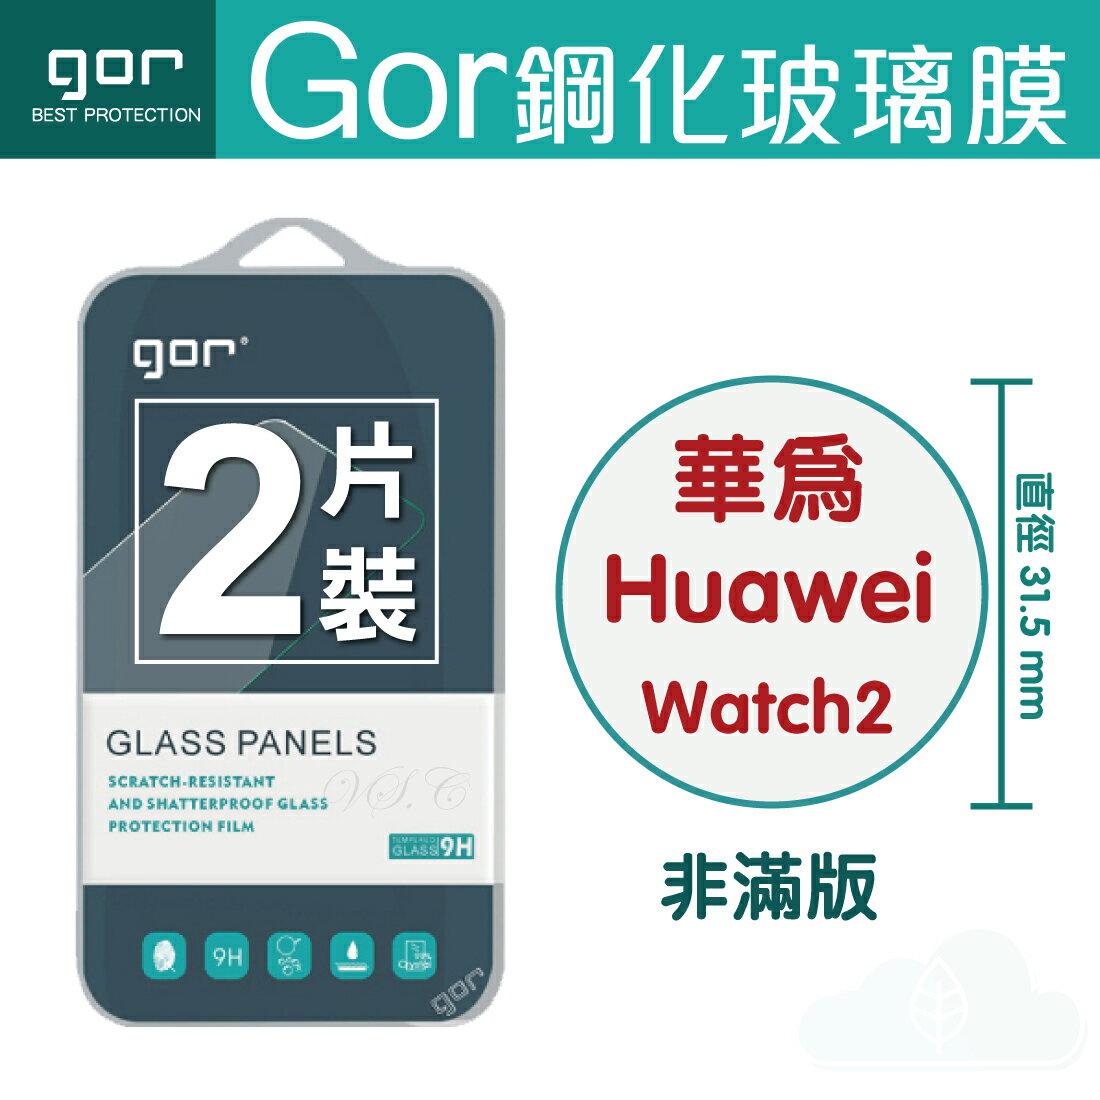 【HUAWEI】GOR 9H 華為 HUAWEI WATCH 2 藍牙 4G版 智慧 手錶 穿戴裝置 鋼化 玻璃 保護貼 全透明非滿版 兩片裝【全館滿299免運費】